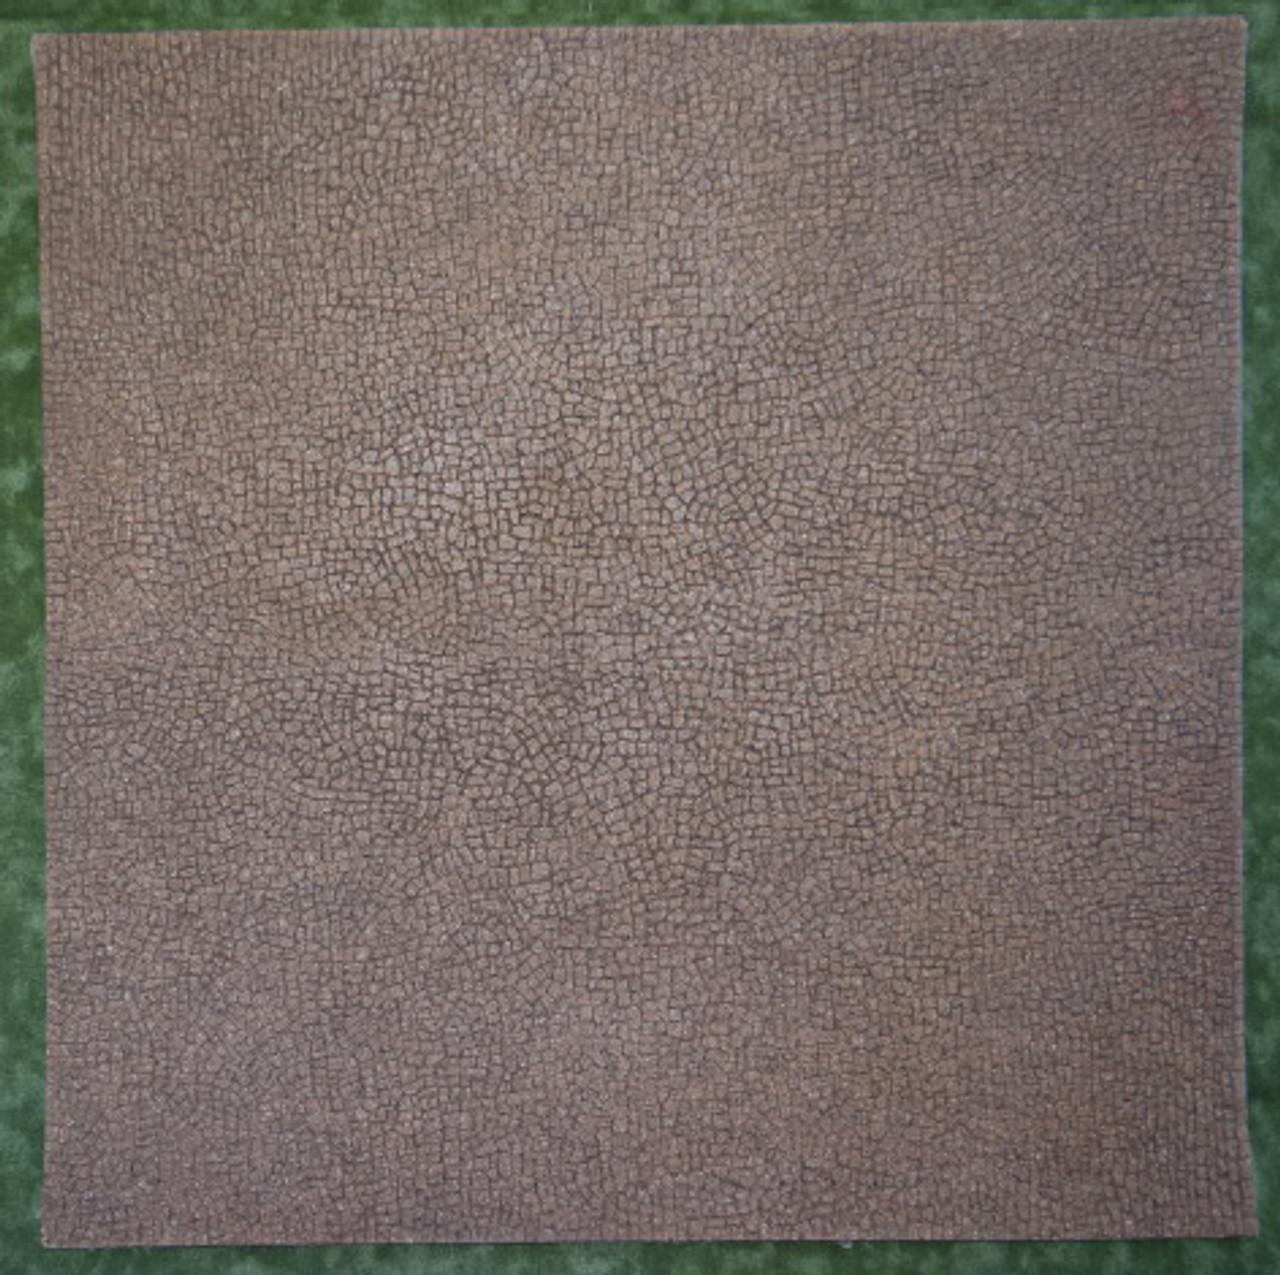 1106-Cobblestone Mediterranean 12x12 Mat